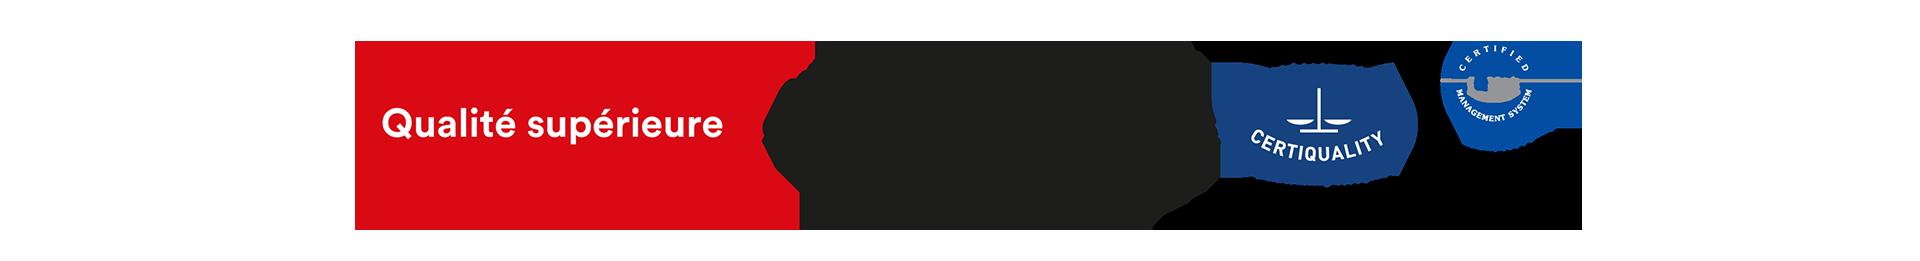 qualite-ISO-1